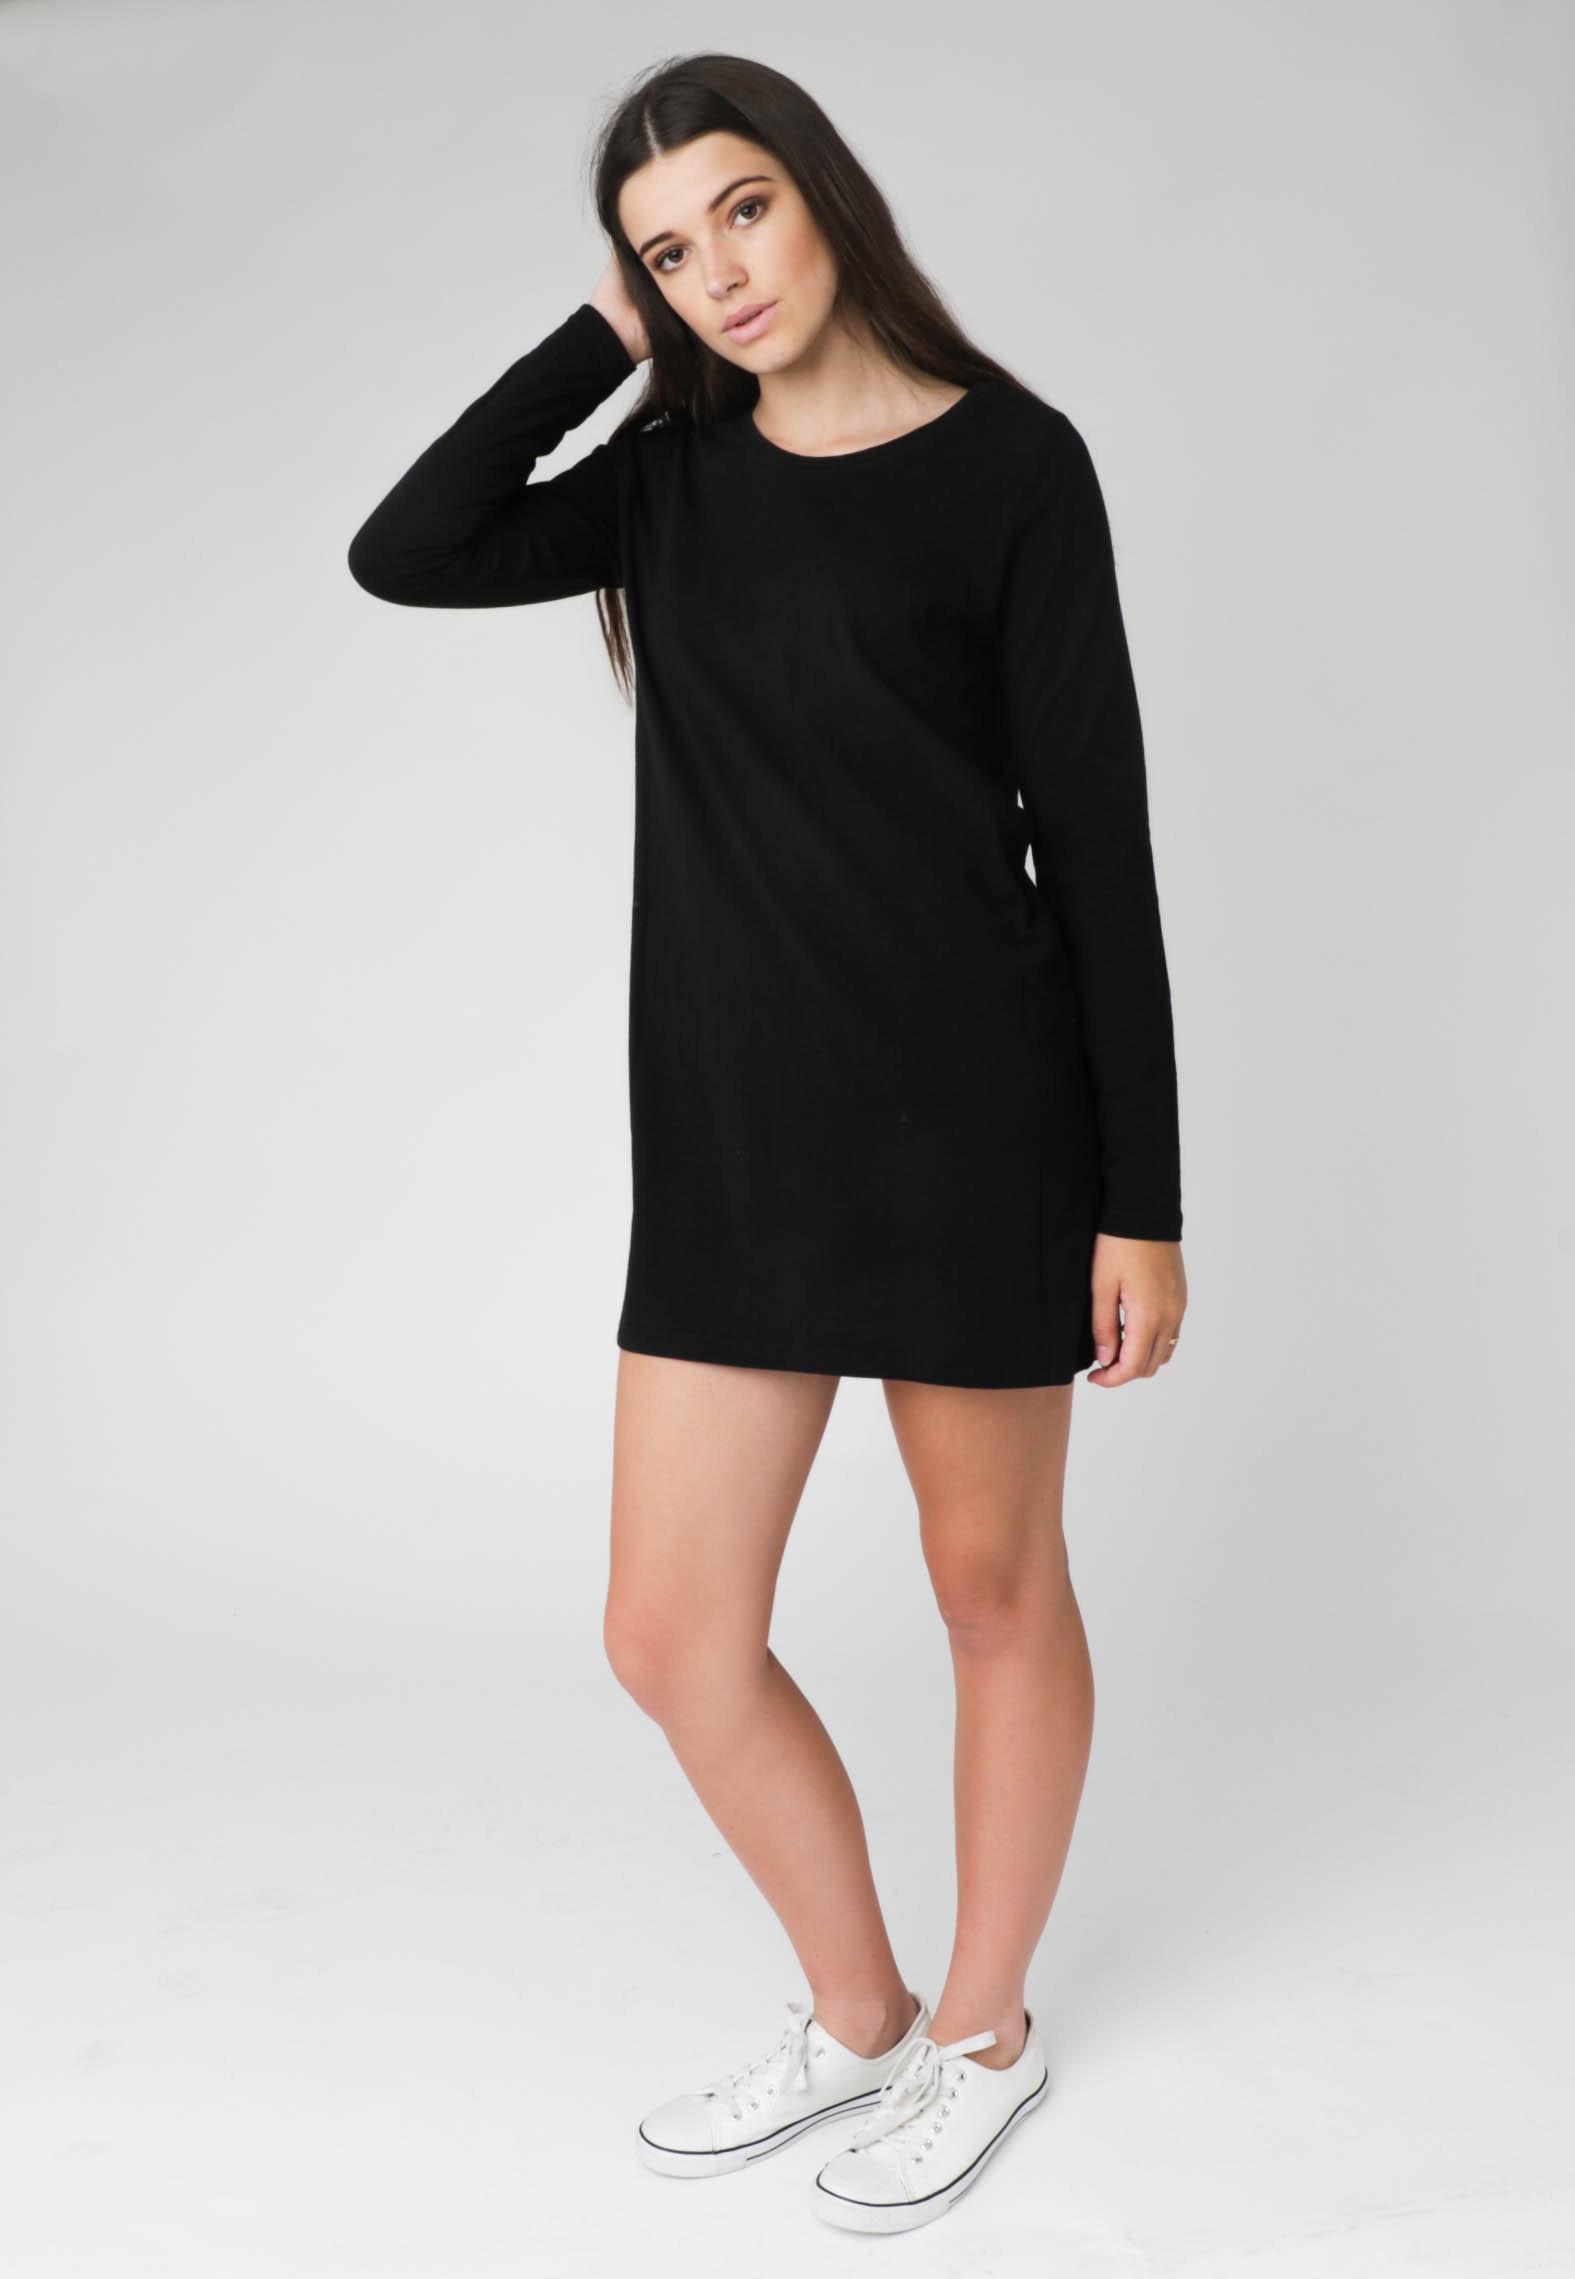 Silent Theory - Got Back L/S Dress - Black